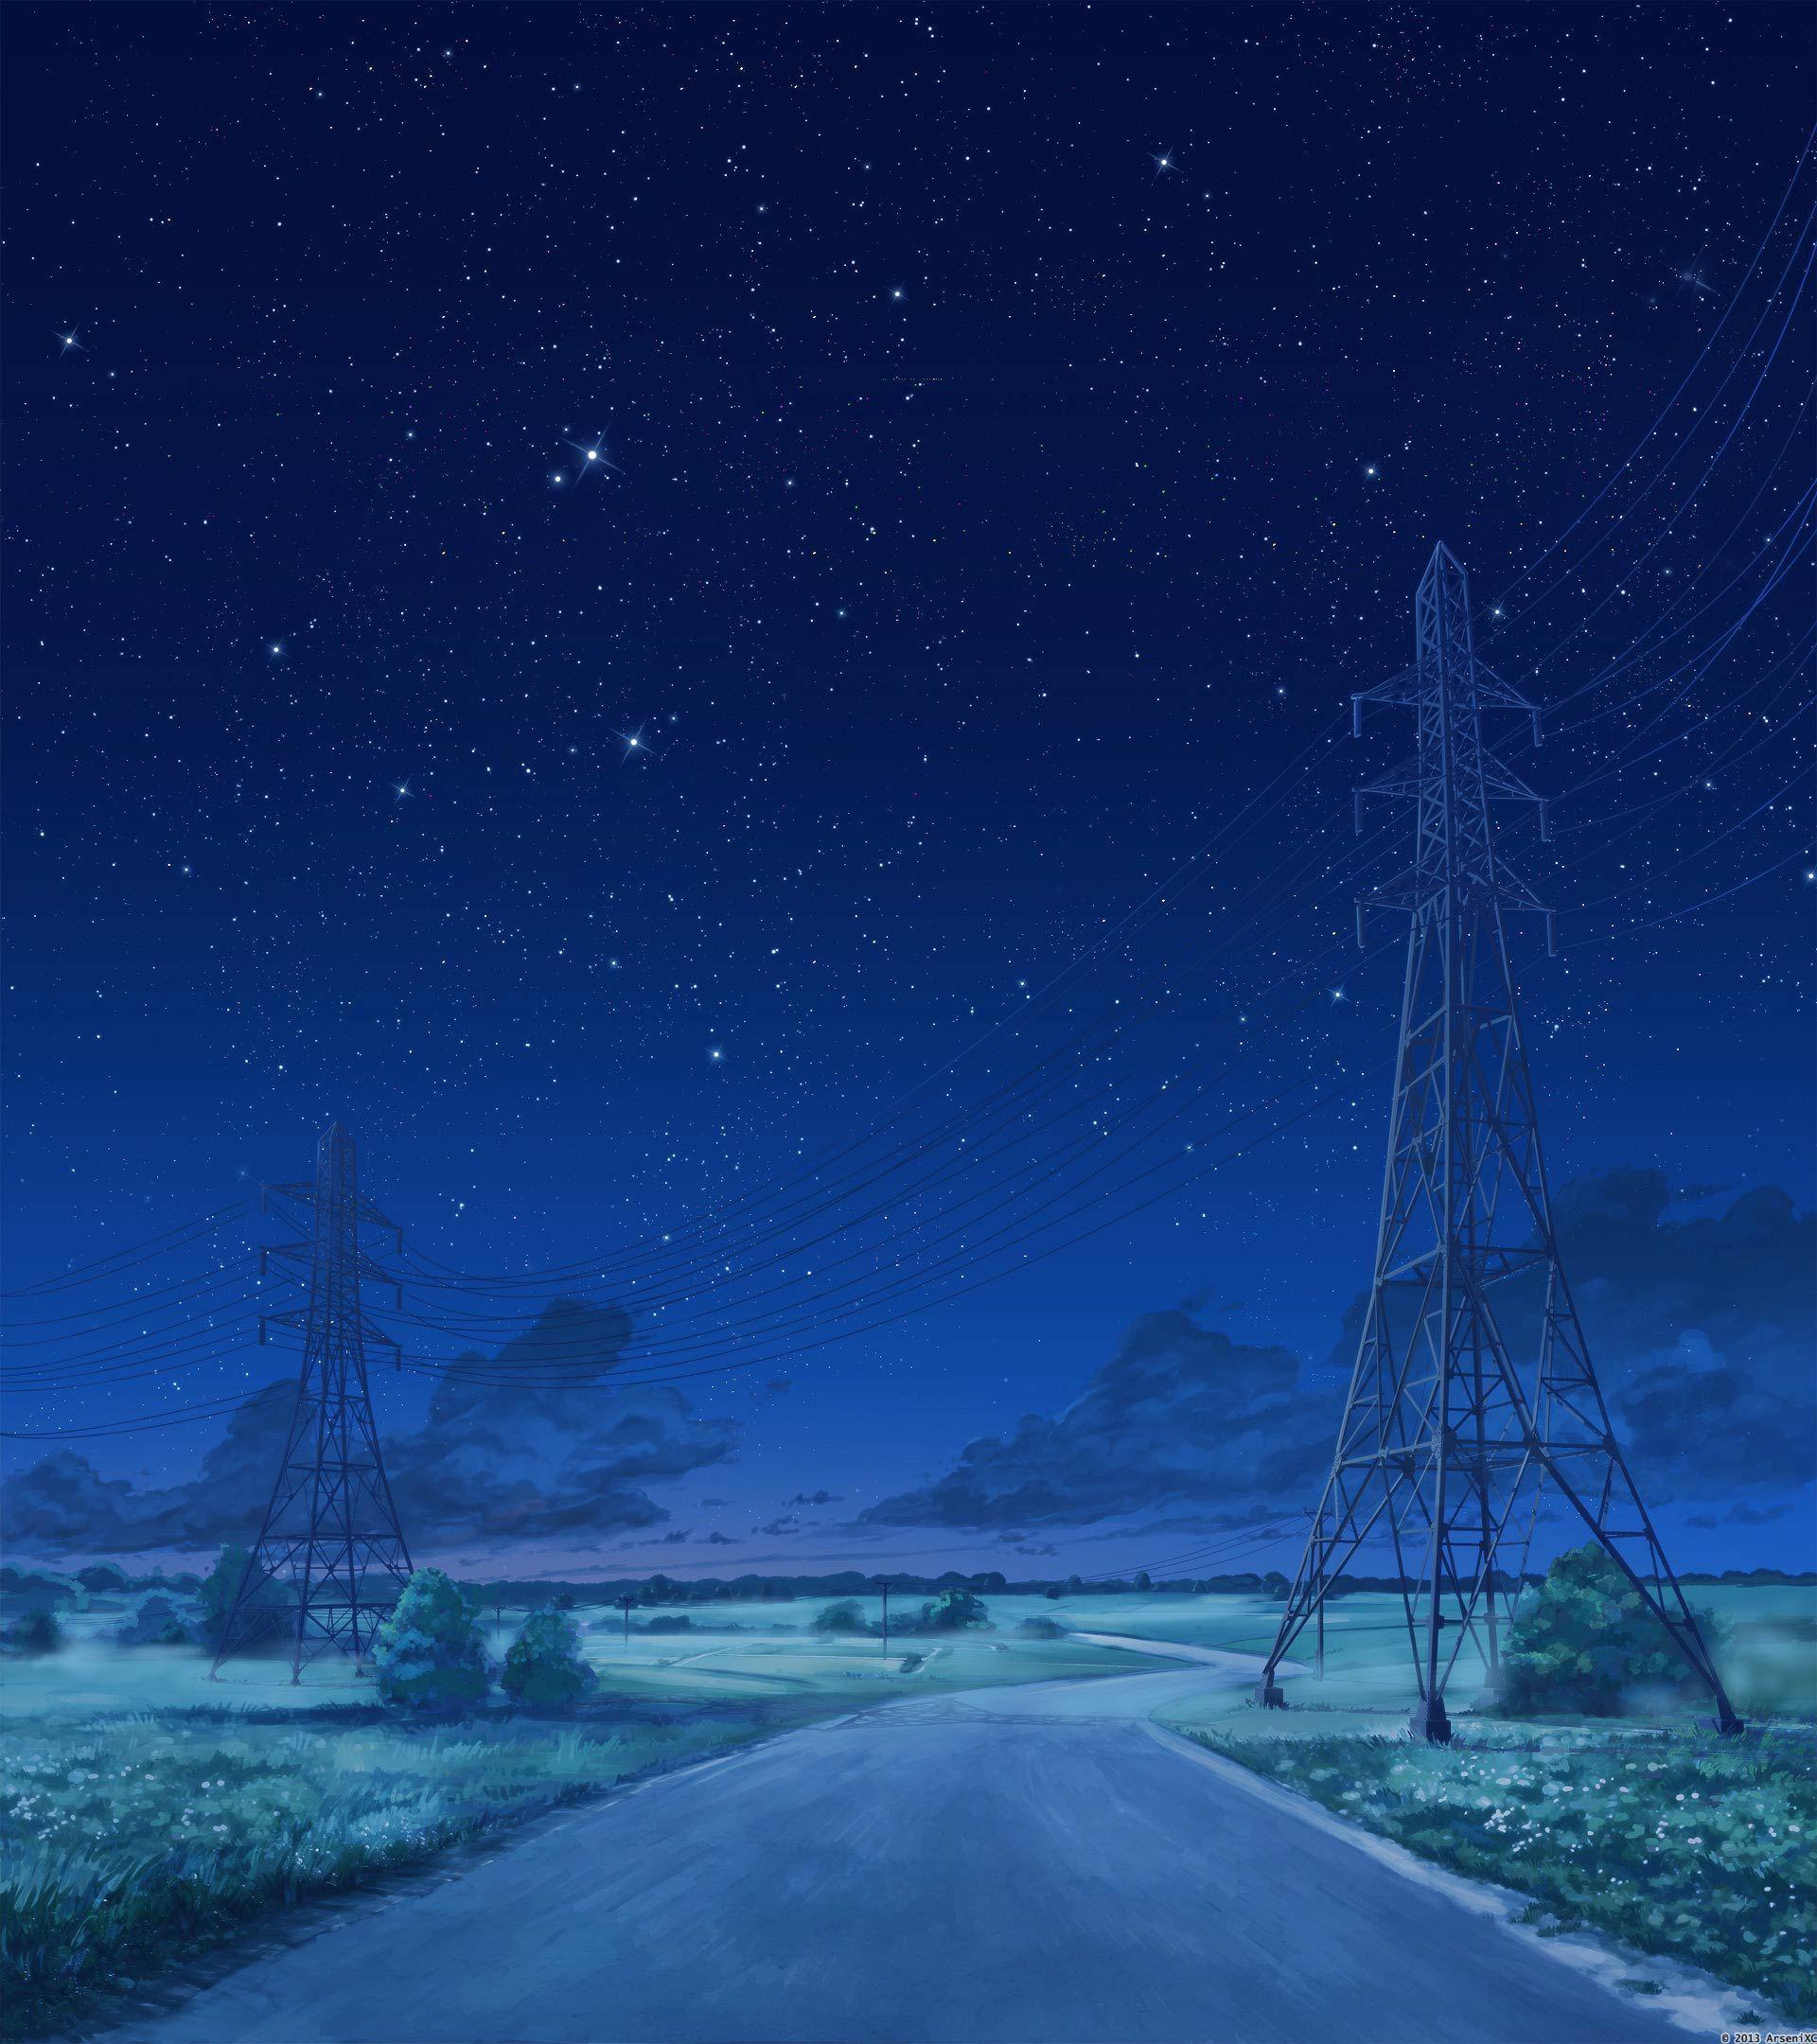 Road Night Version 2 By Arsenixc Deviantart Com On Deviantart Anime Scenery Night Sky Stars Summer Landscape